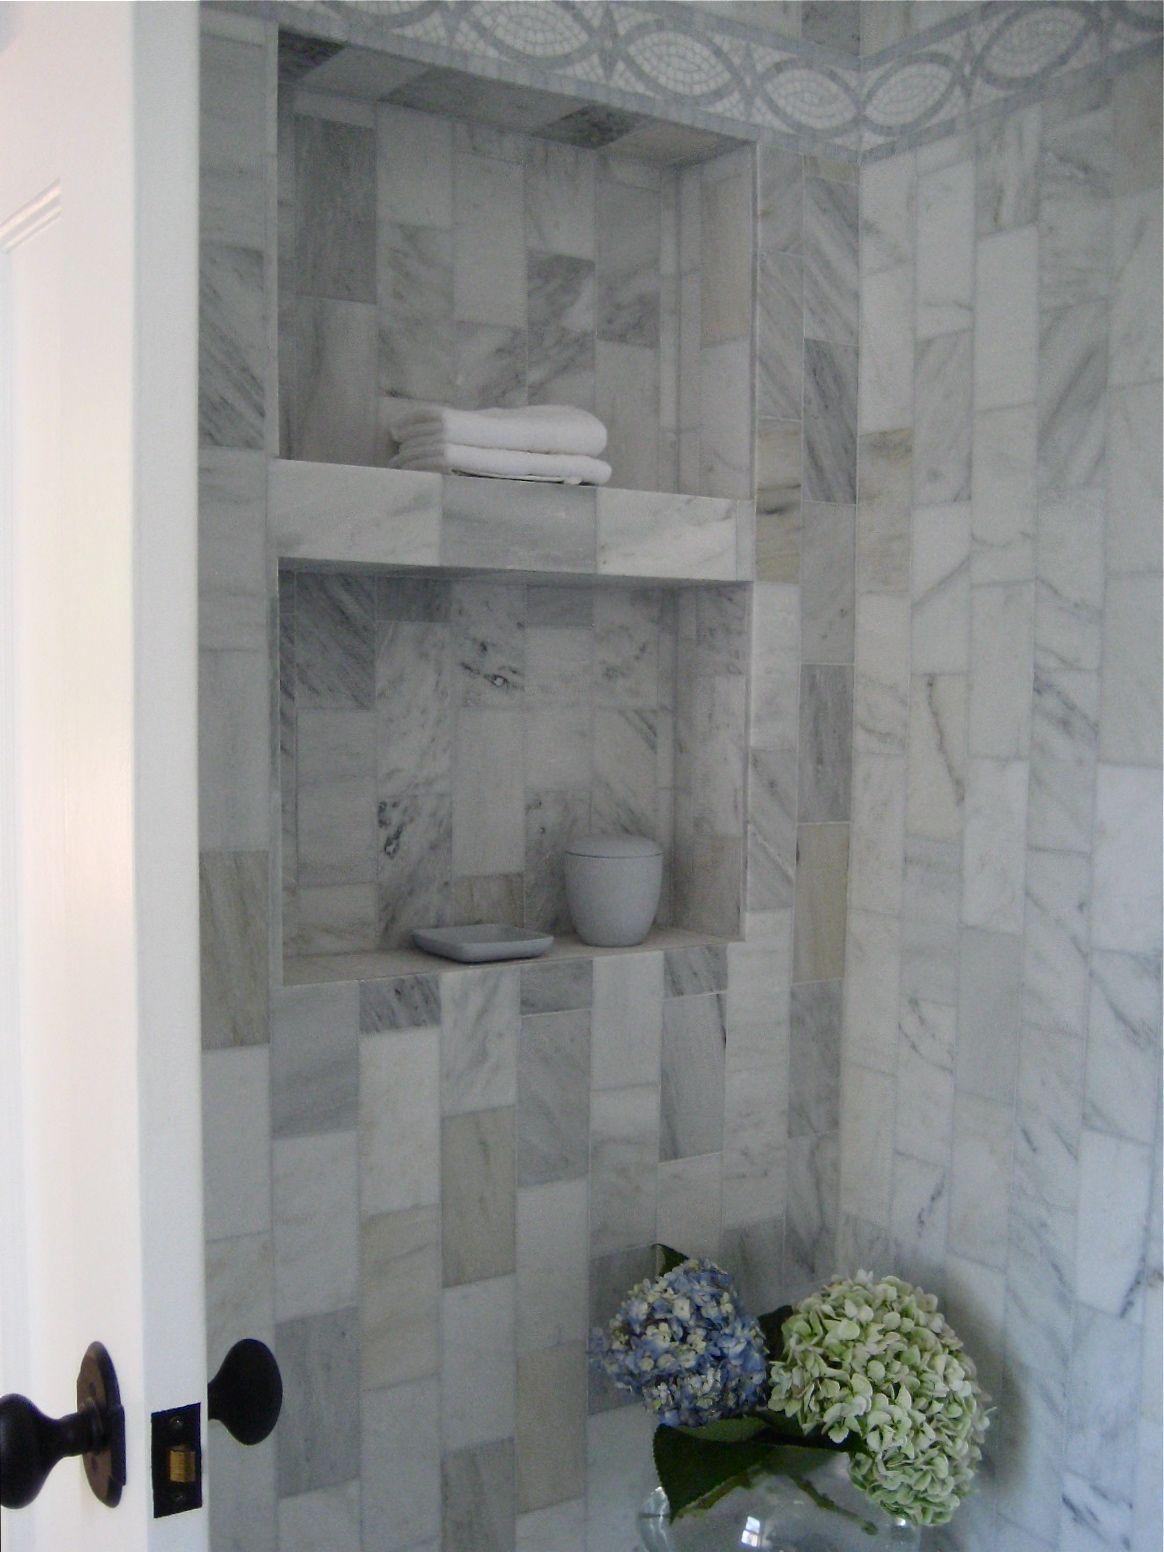 Classic Carrara Marble Shower Niche Ann Sacks Decorative Shower Tiles Doheny Los Angeles California Ht Shower Niche Bathroom Interior Design Marble Showers